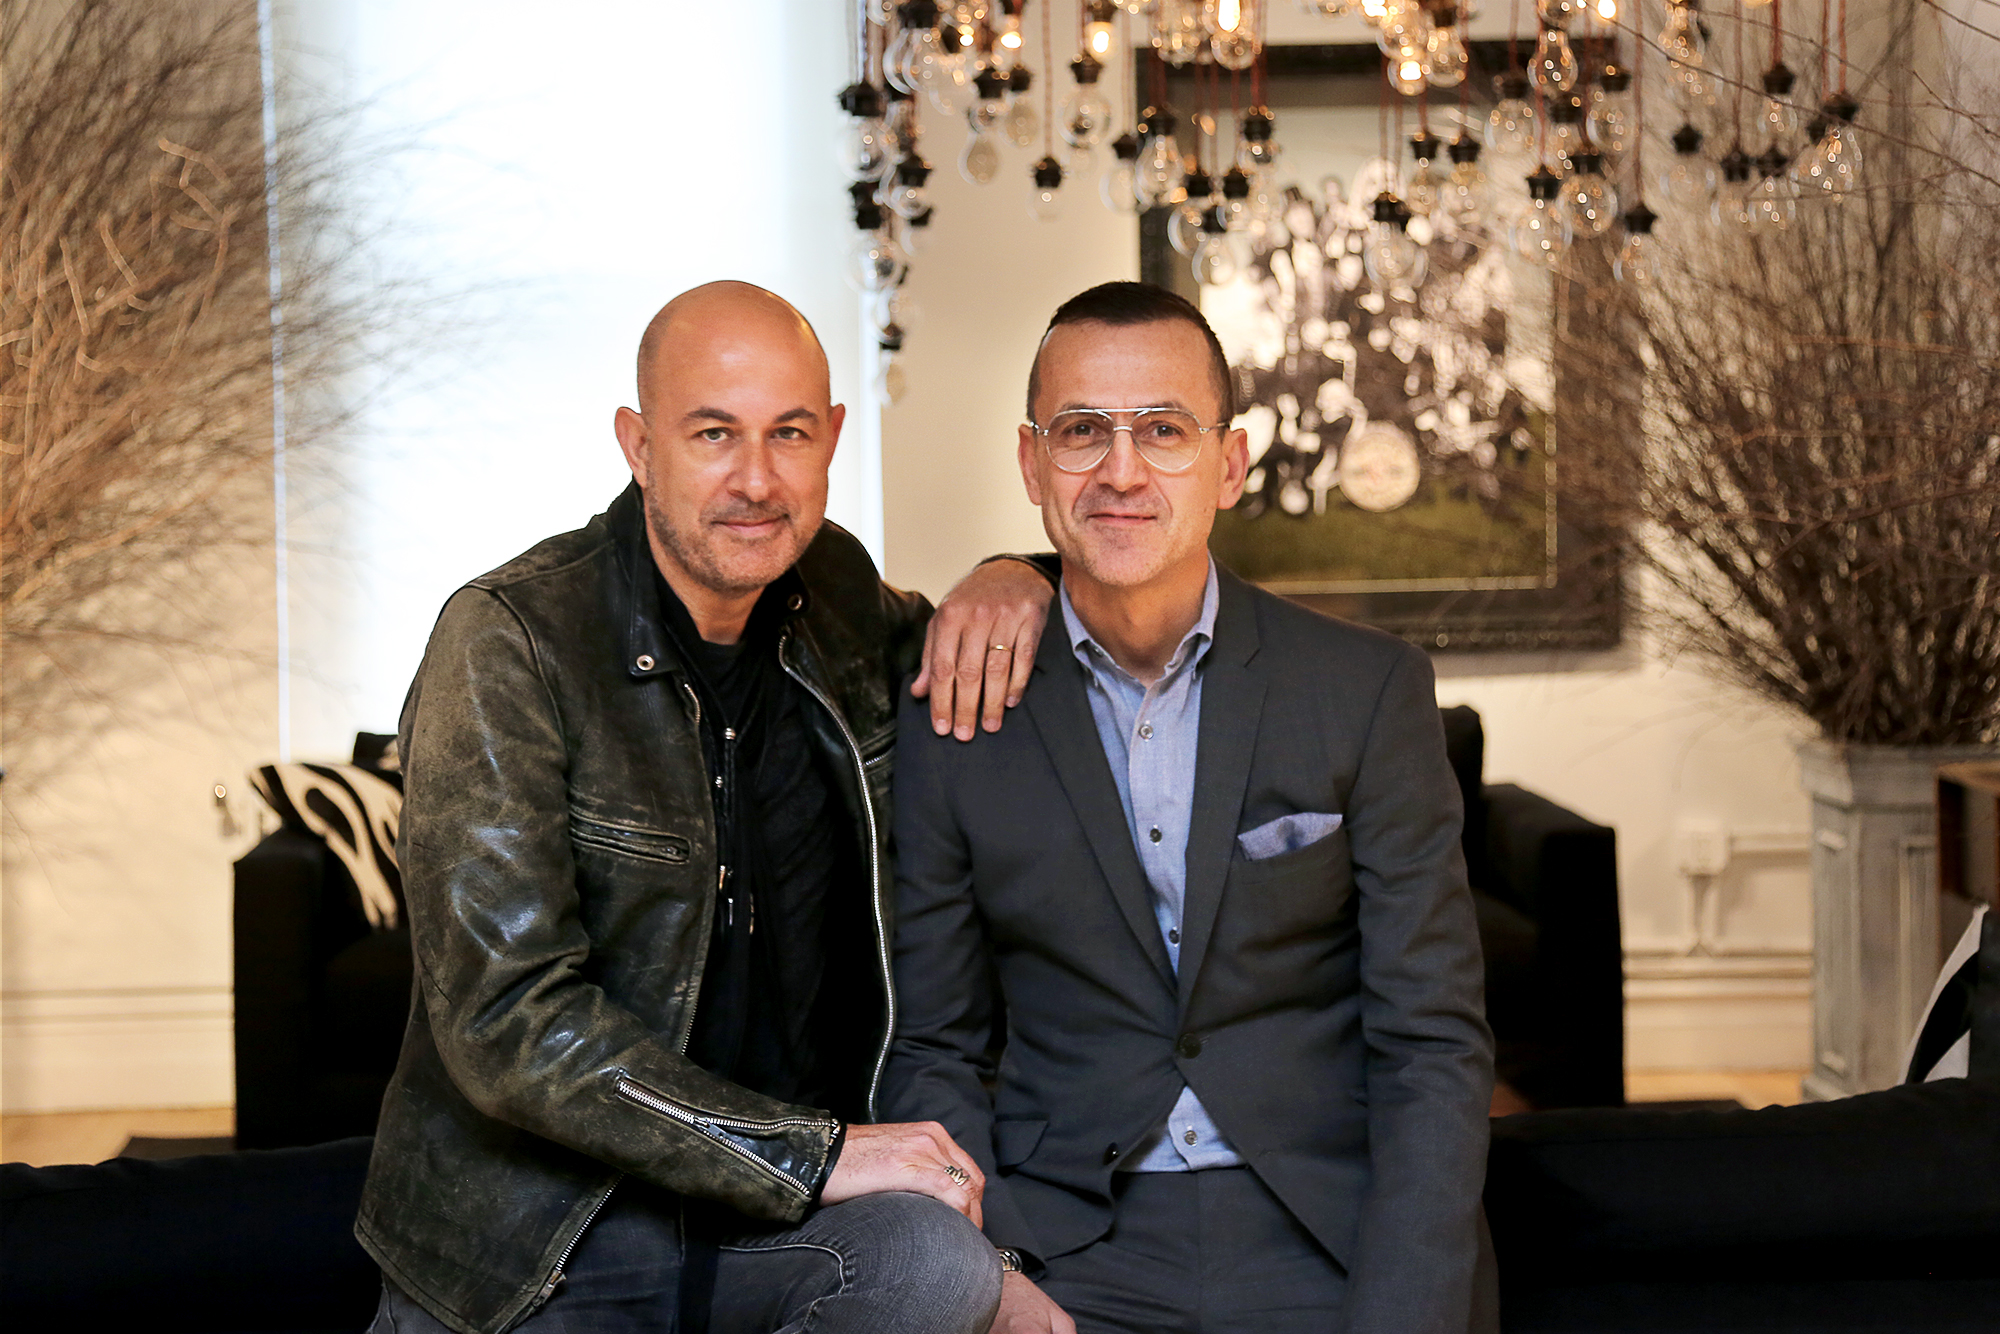 John Varvatos and CFDA CEO Steven Kolb; Photo courtesy of John Varvatos